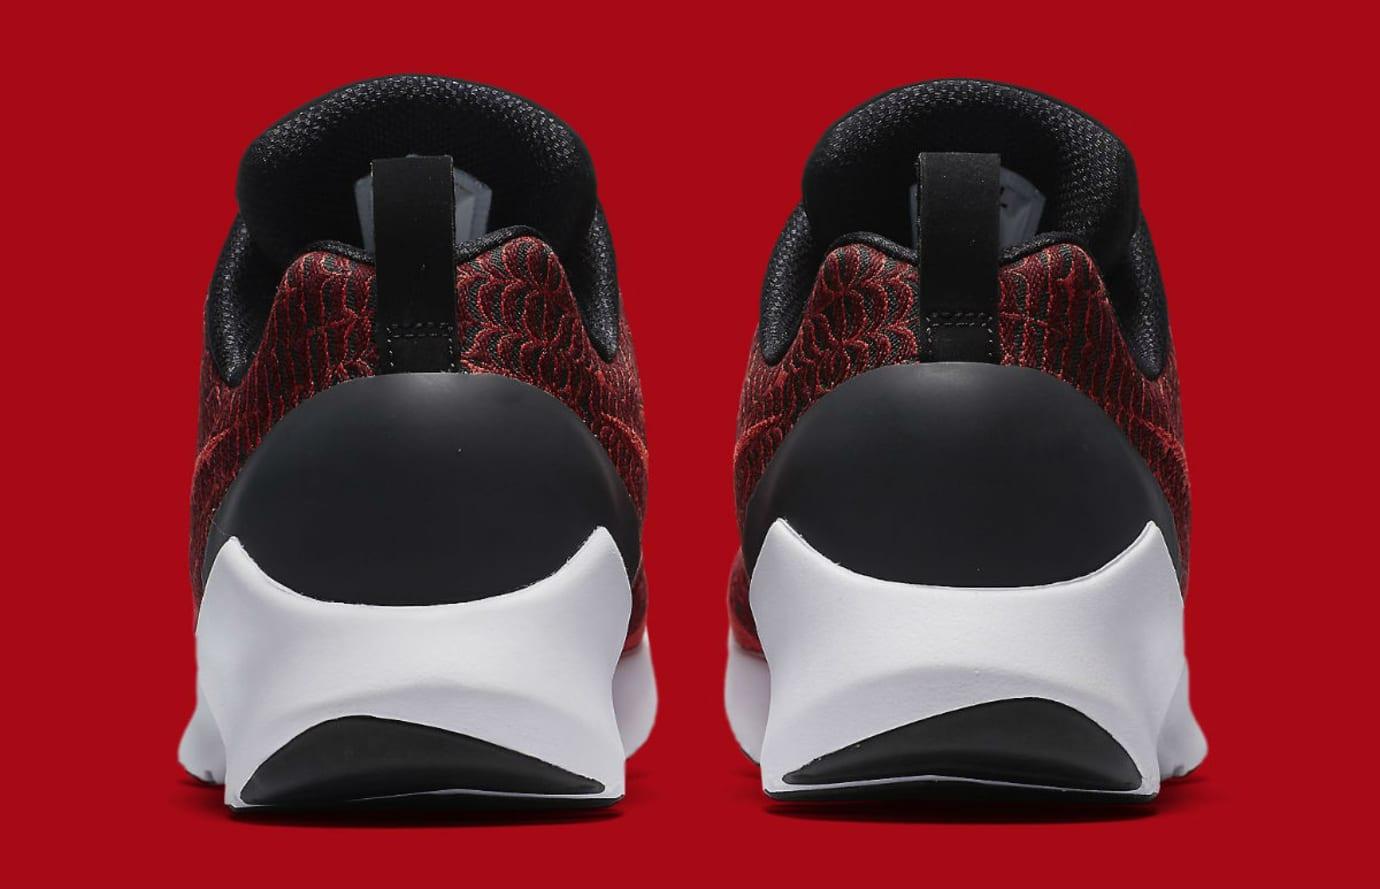 Nike HyperAdapt 1.0 Habanero Red Release Date 843871-600 Heel